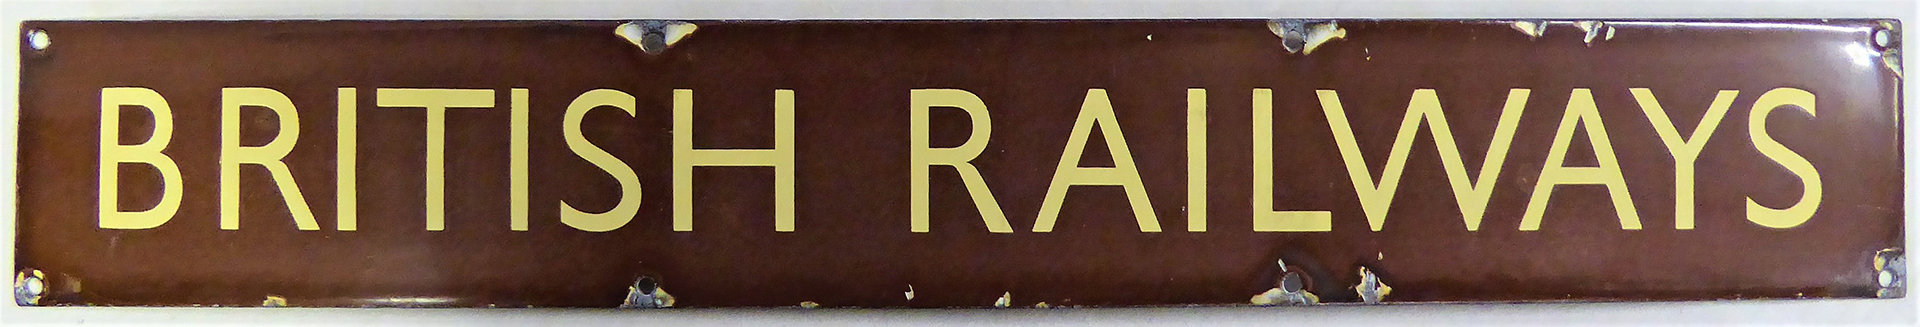 BR(W) Enamel Poster Board Heading BRITISH RAILWAYS. Original condition.